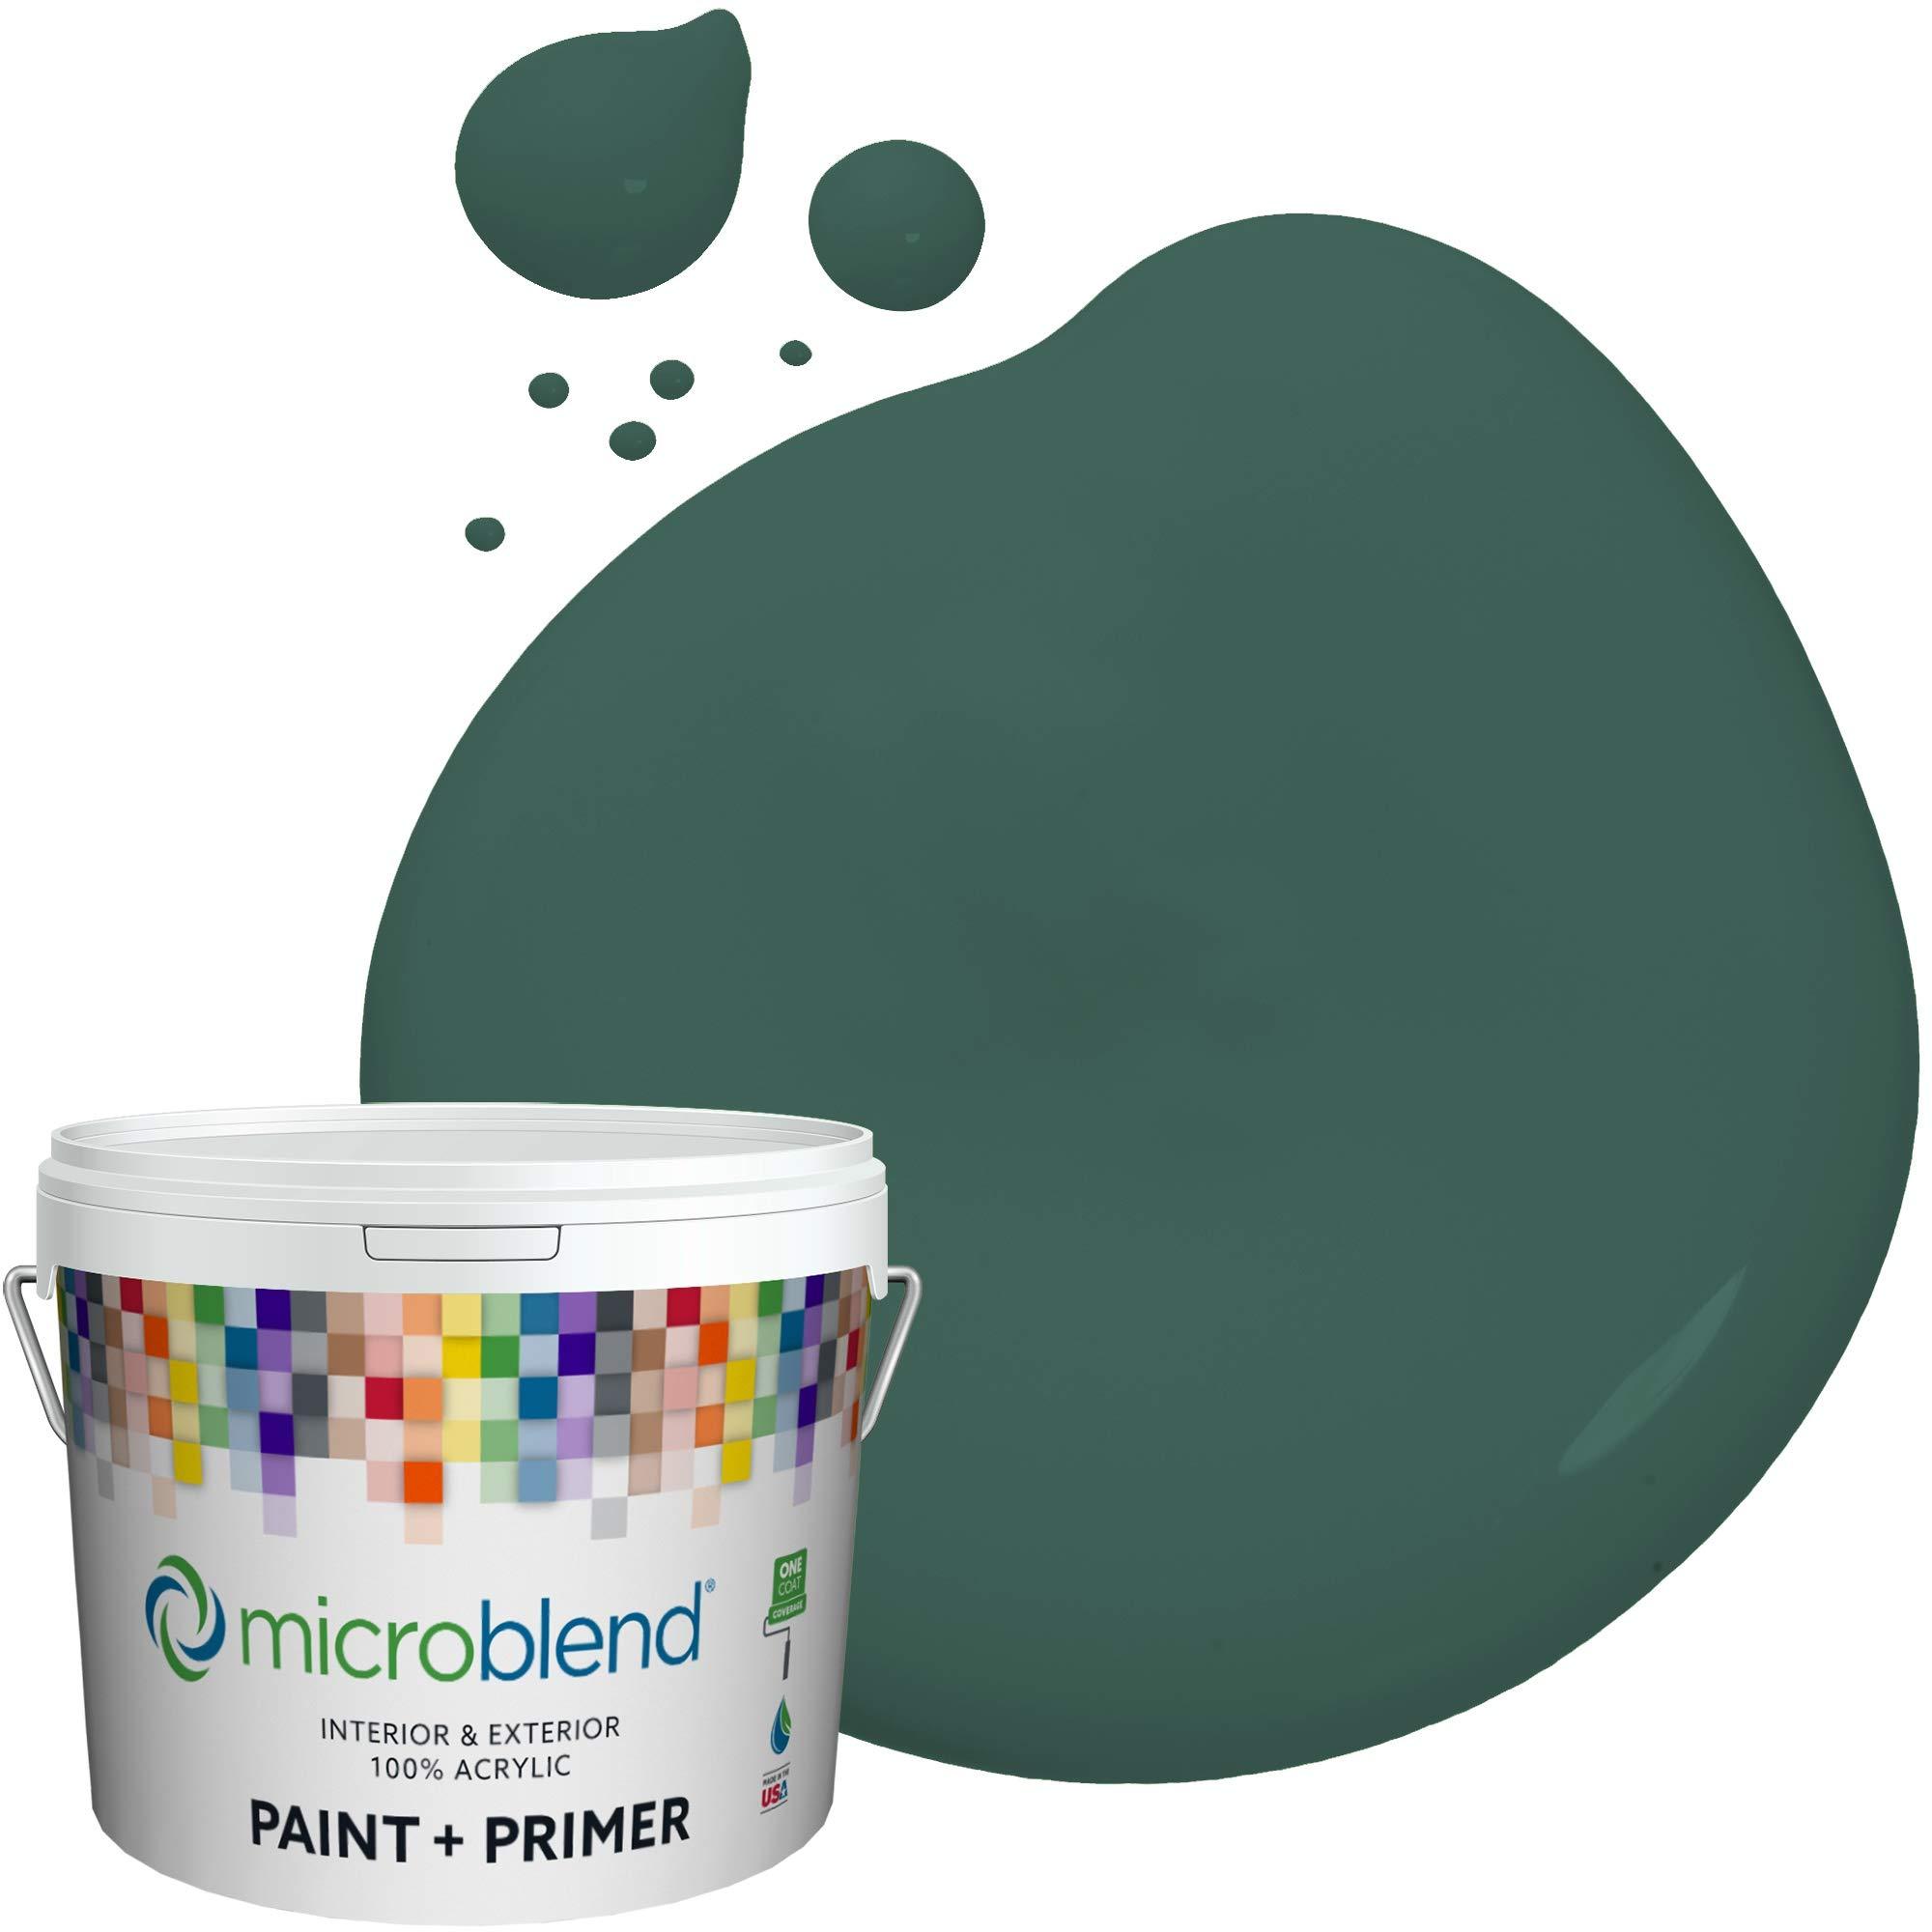 MicroBlend Exterior Paint + Primer, Vineyard Garden, Eggshell Sheen, 1 Gallon, Custom Made, Premium Quality One Coat Hide & Washable Paint